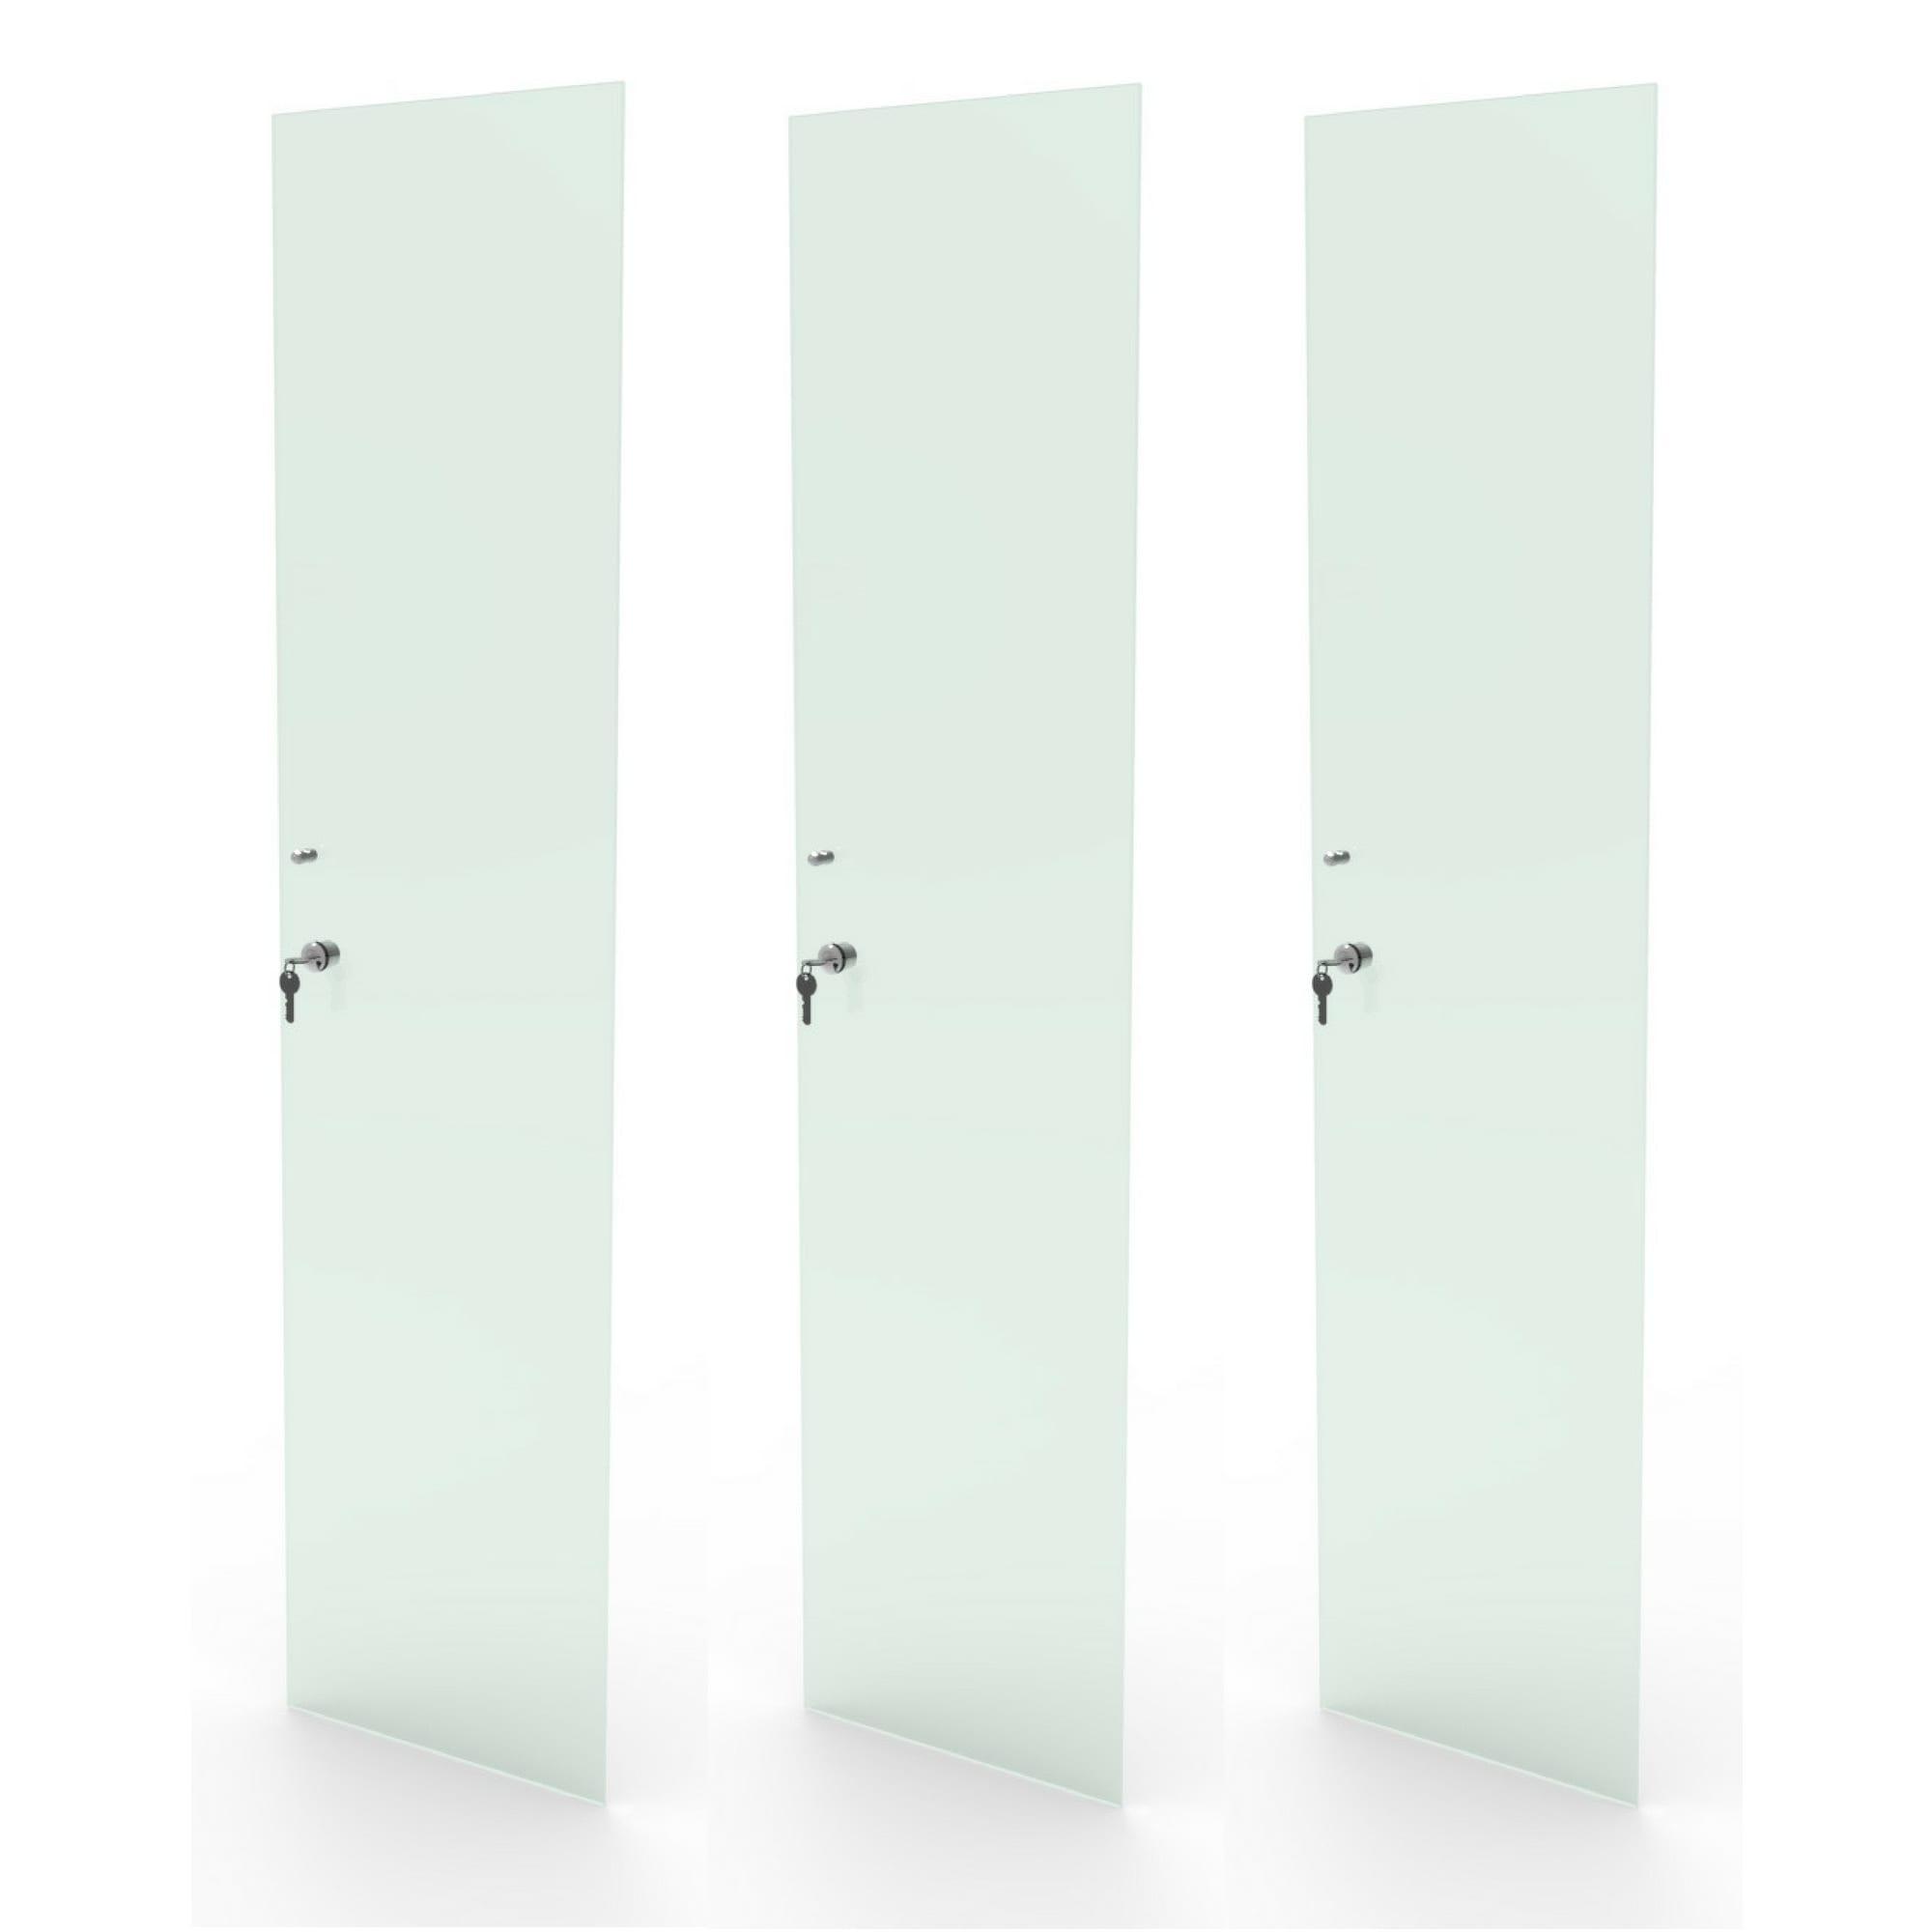 Kit 3 portas de vidro incolor com chave para estante bookcase Bürohaus